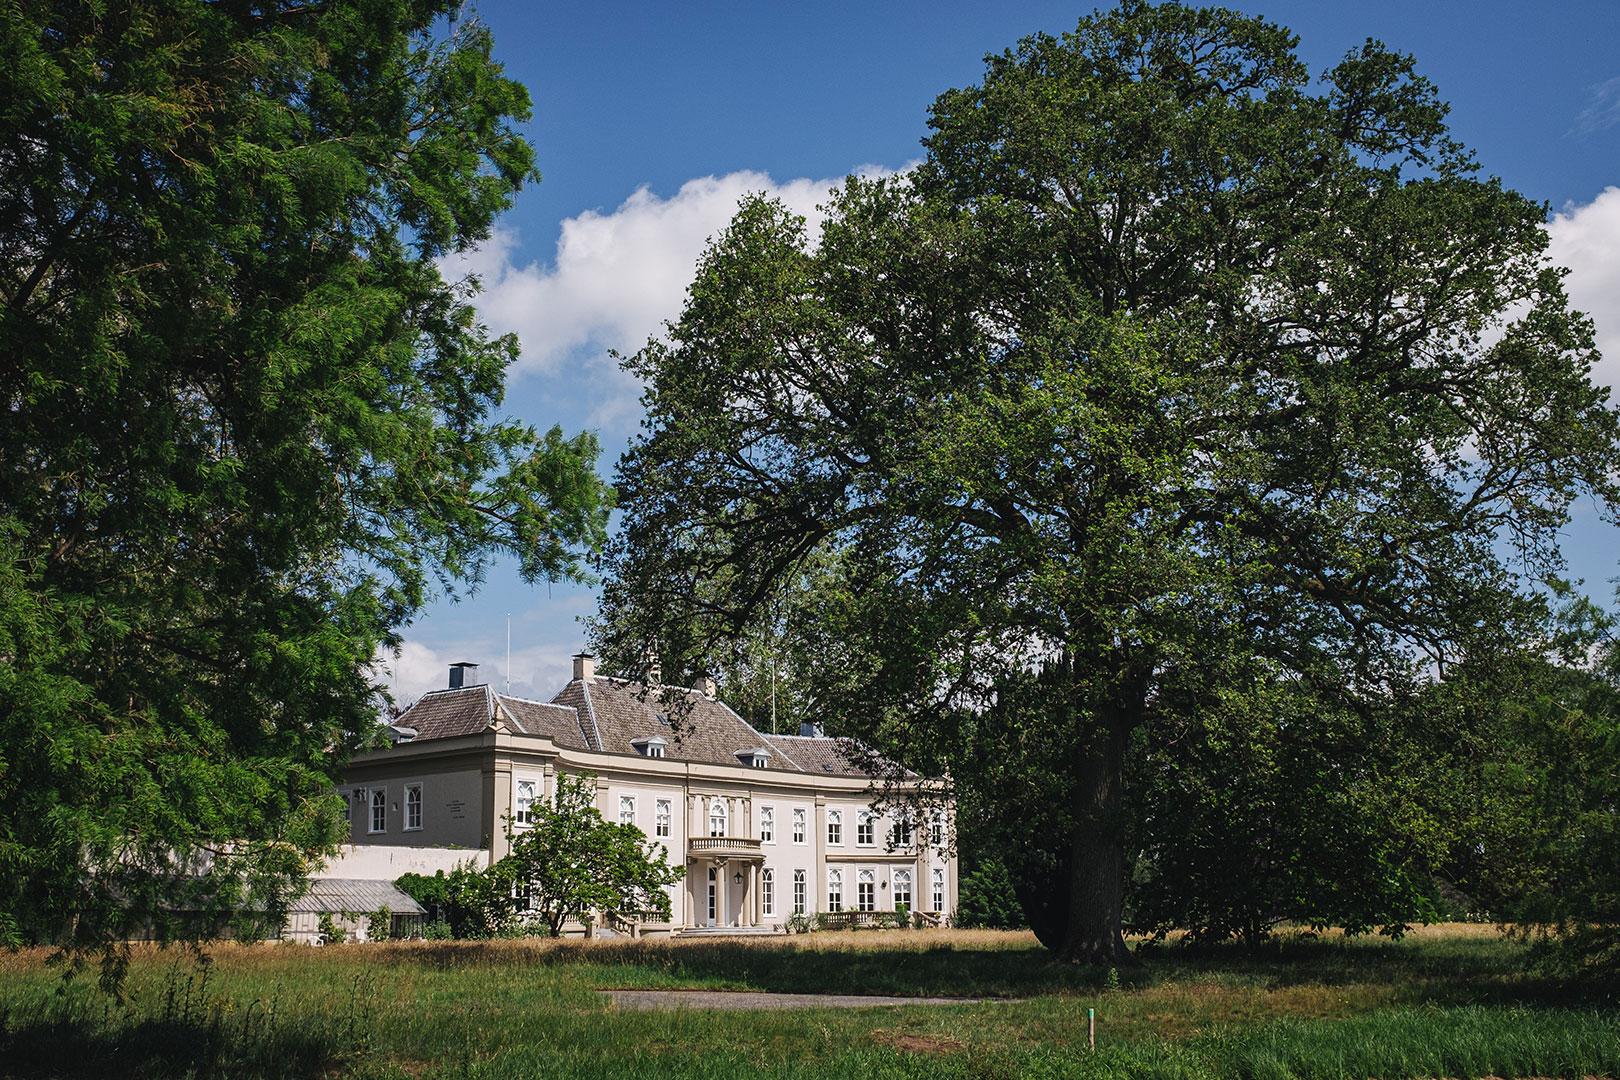 Landgut Huis Landfort Megchelen